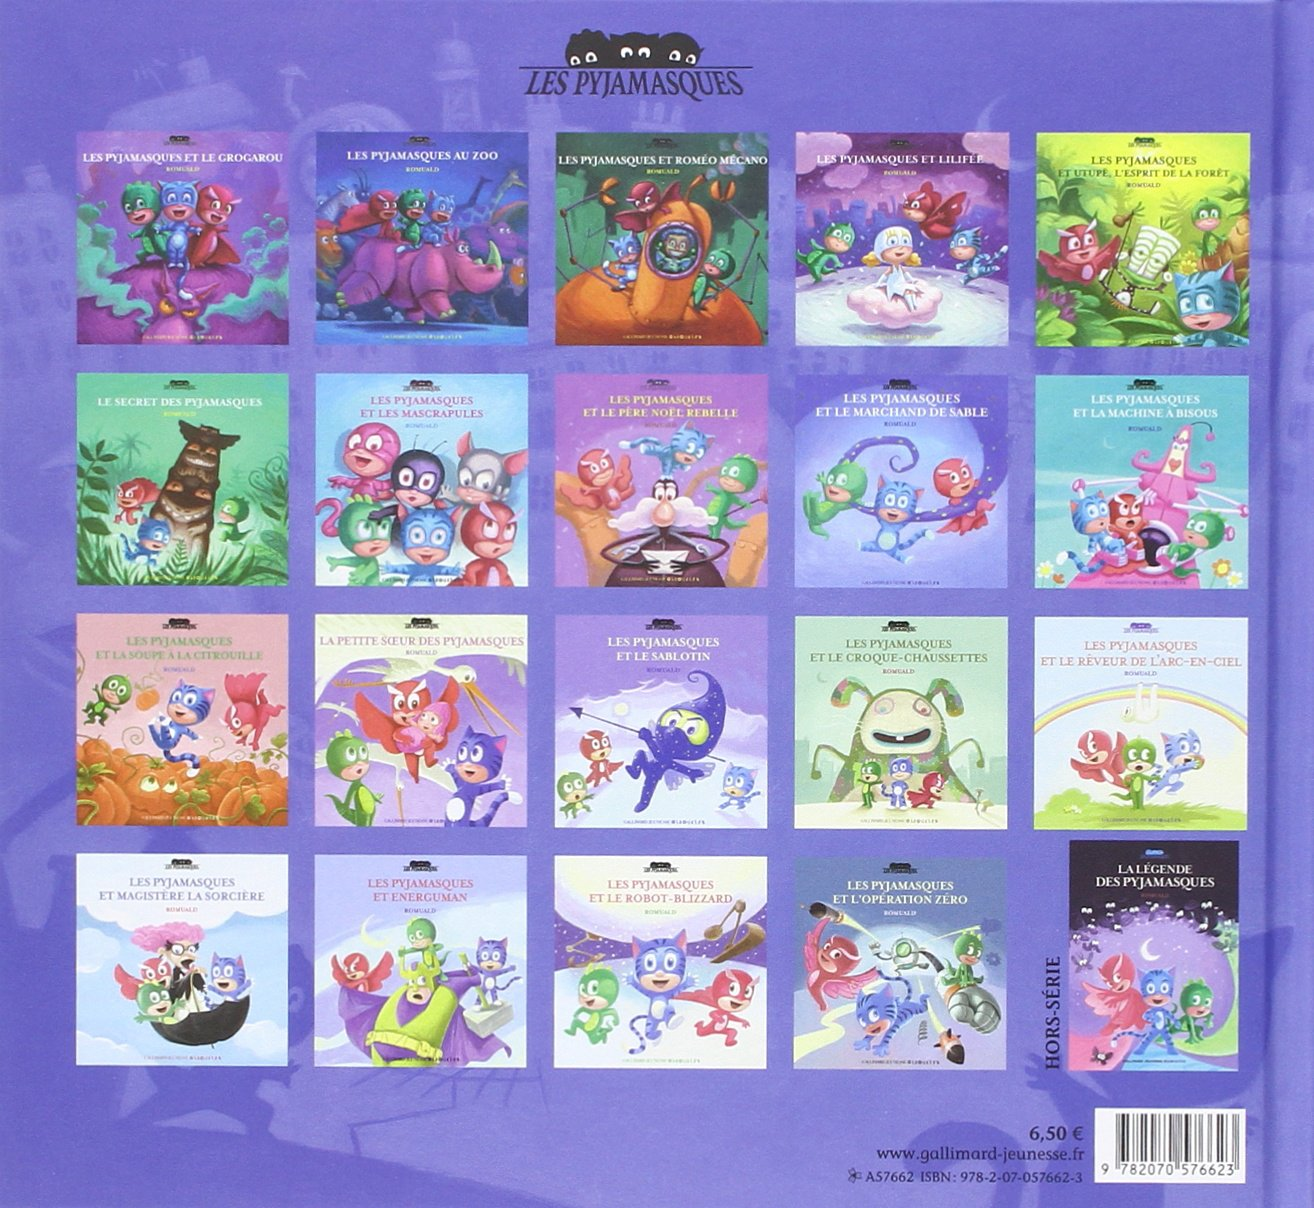 Les Pyjamasques au zoo (French Edition): ROMUALD RACIOPPO: 9782070576623: Amazon.com: Books